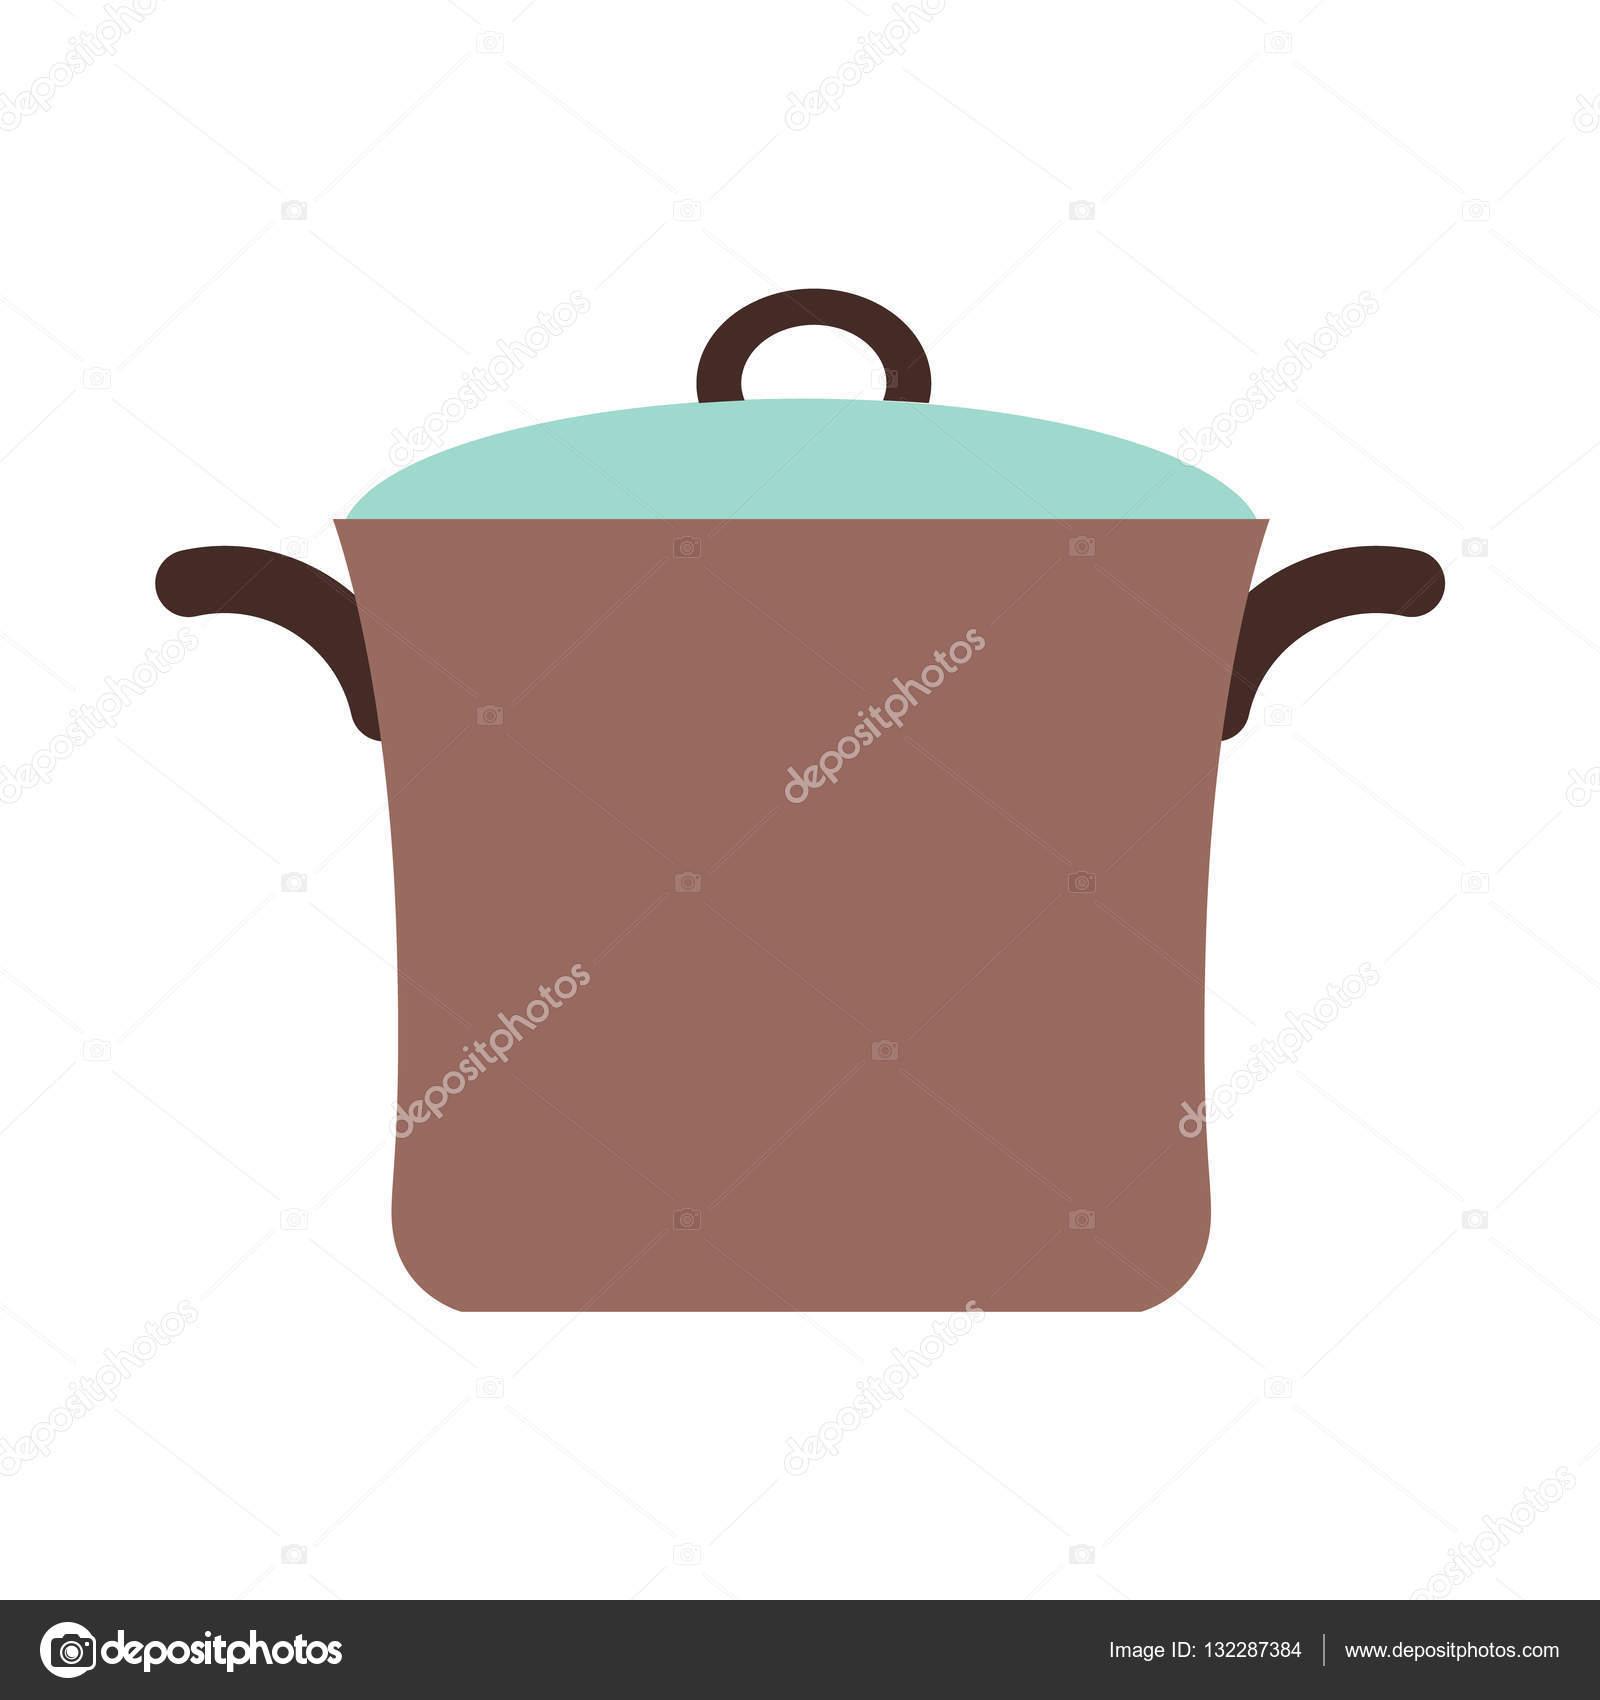 kitchen aid range cabinets online 矢量多彩厨房范围与器具 图库矢量图像 c oligliya 132287384 图库矢量图片